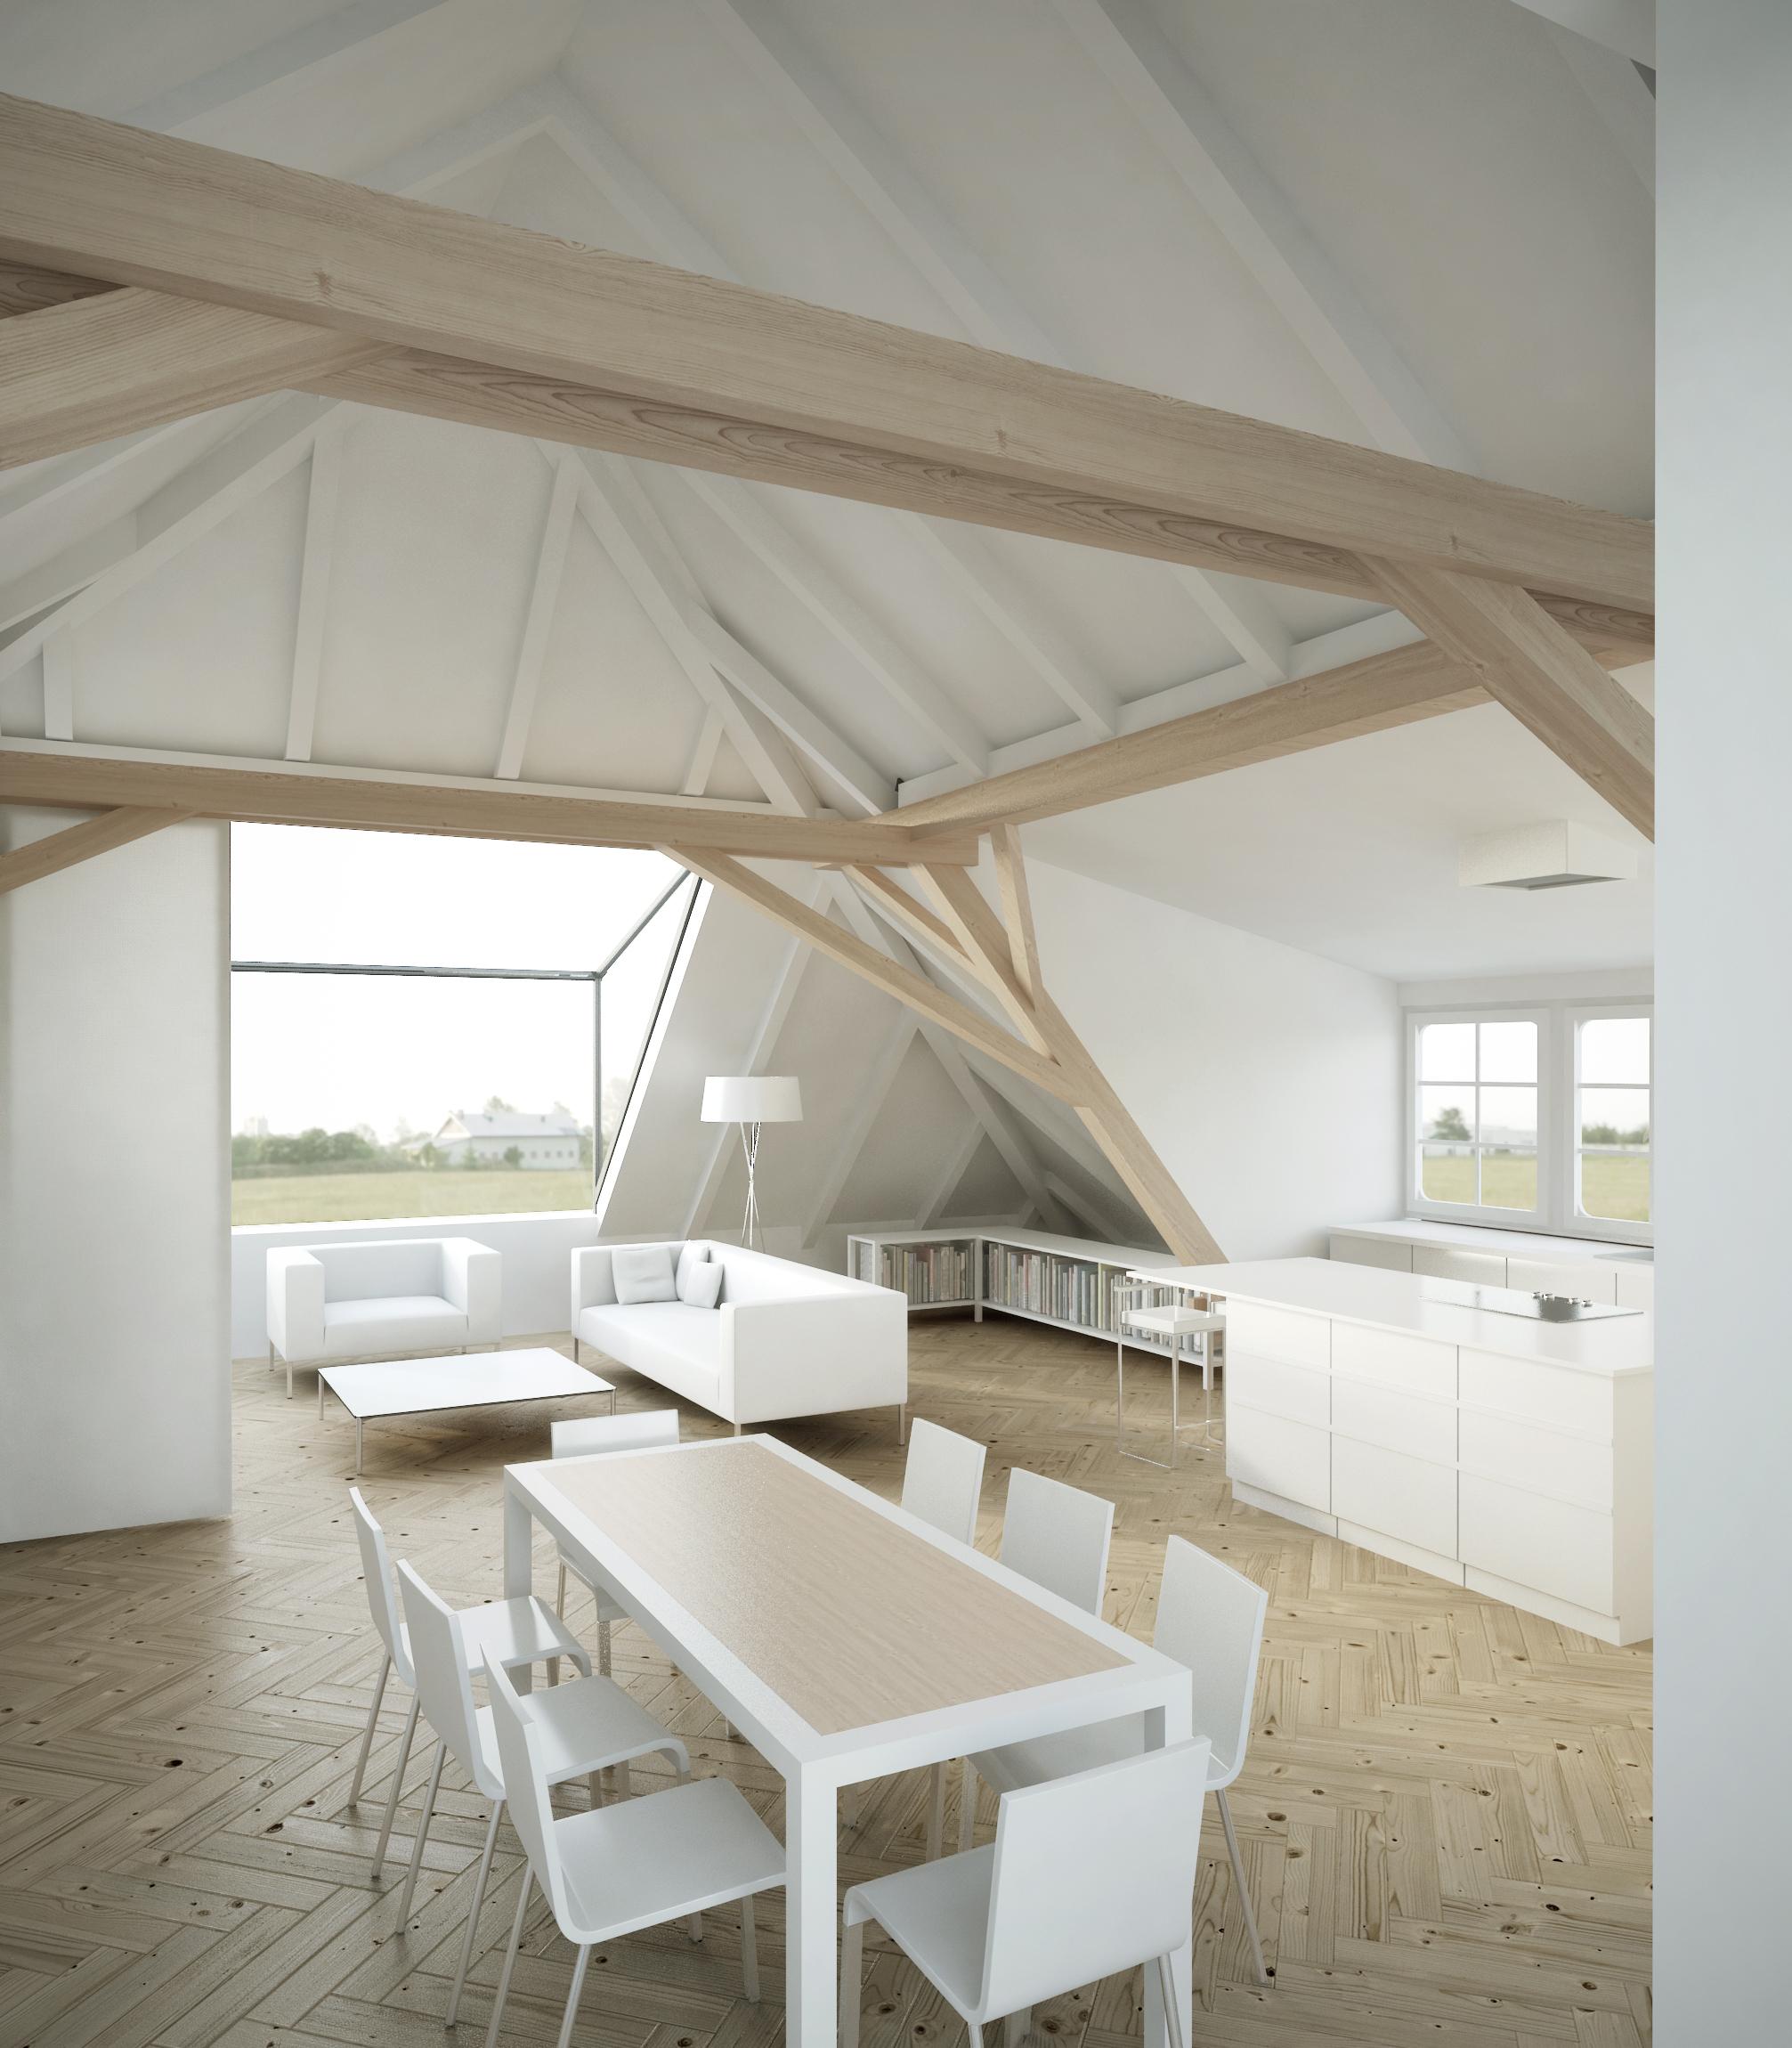 Dachbodenausbau, Frühstücksterrasse